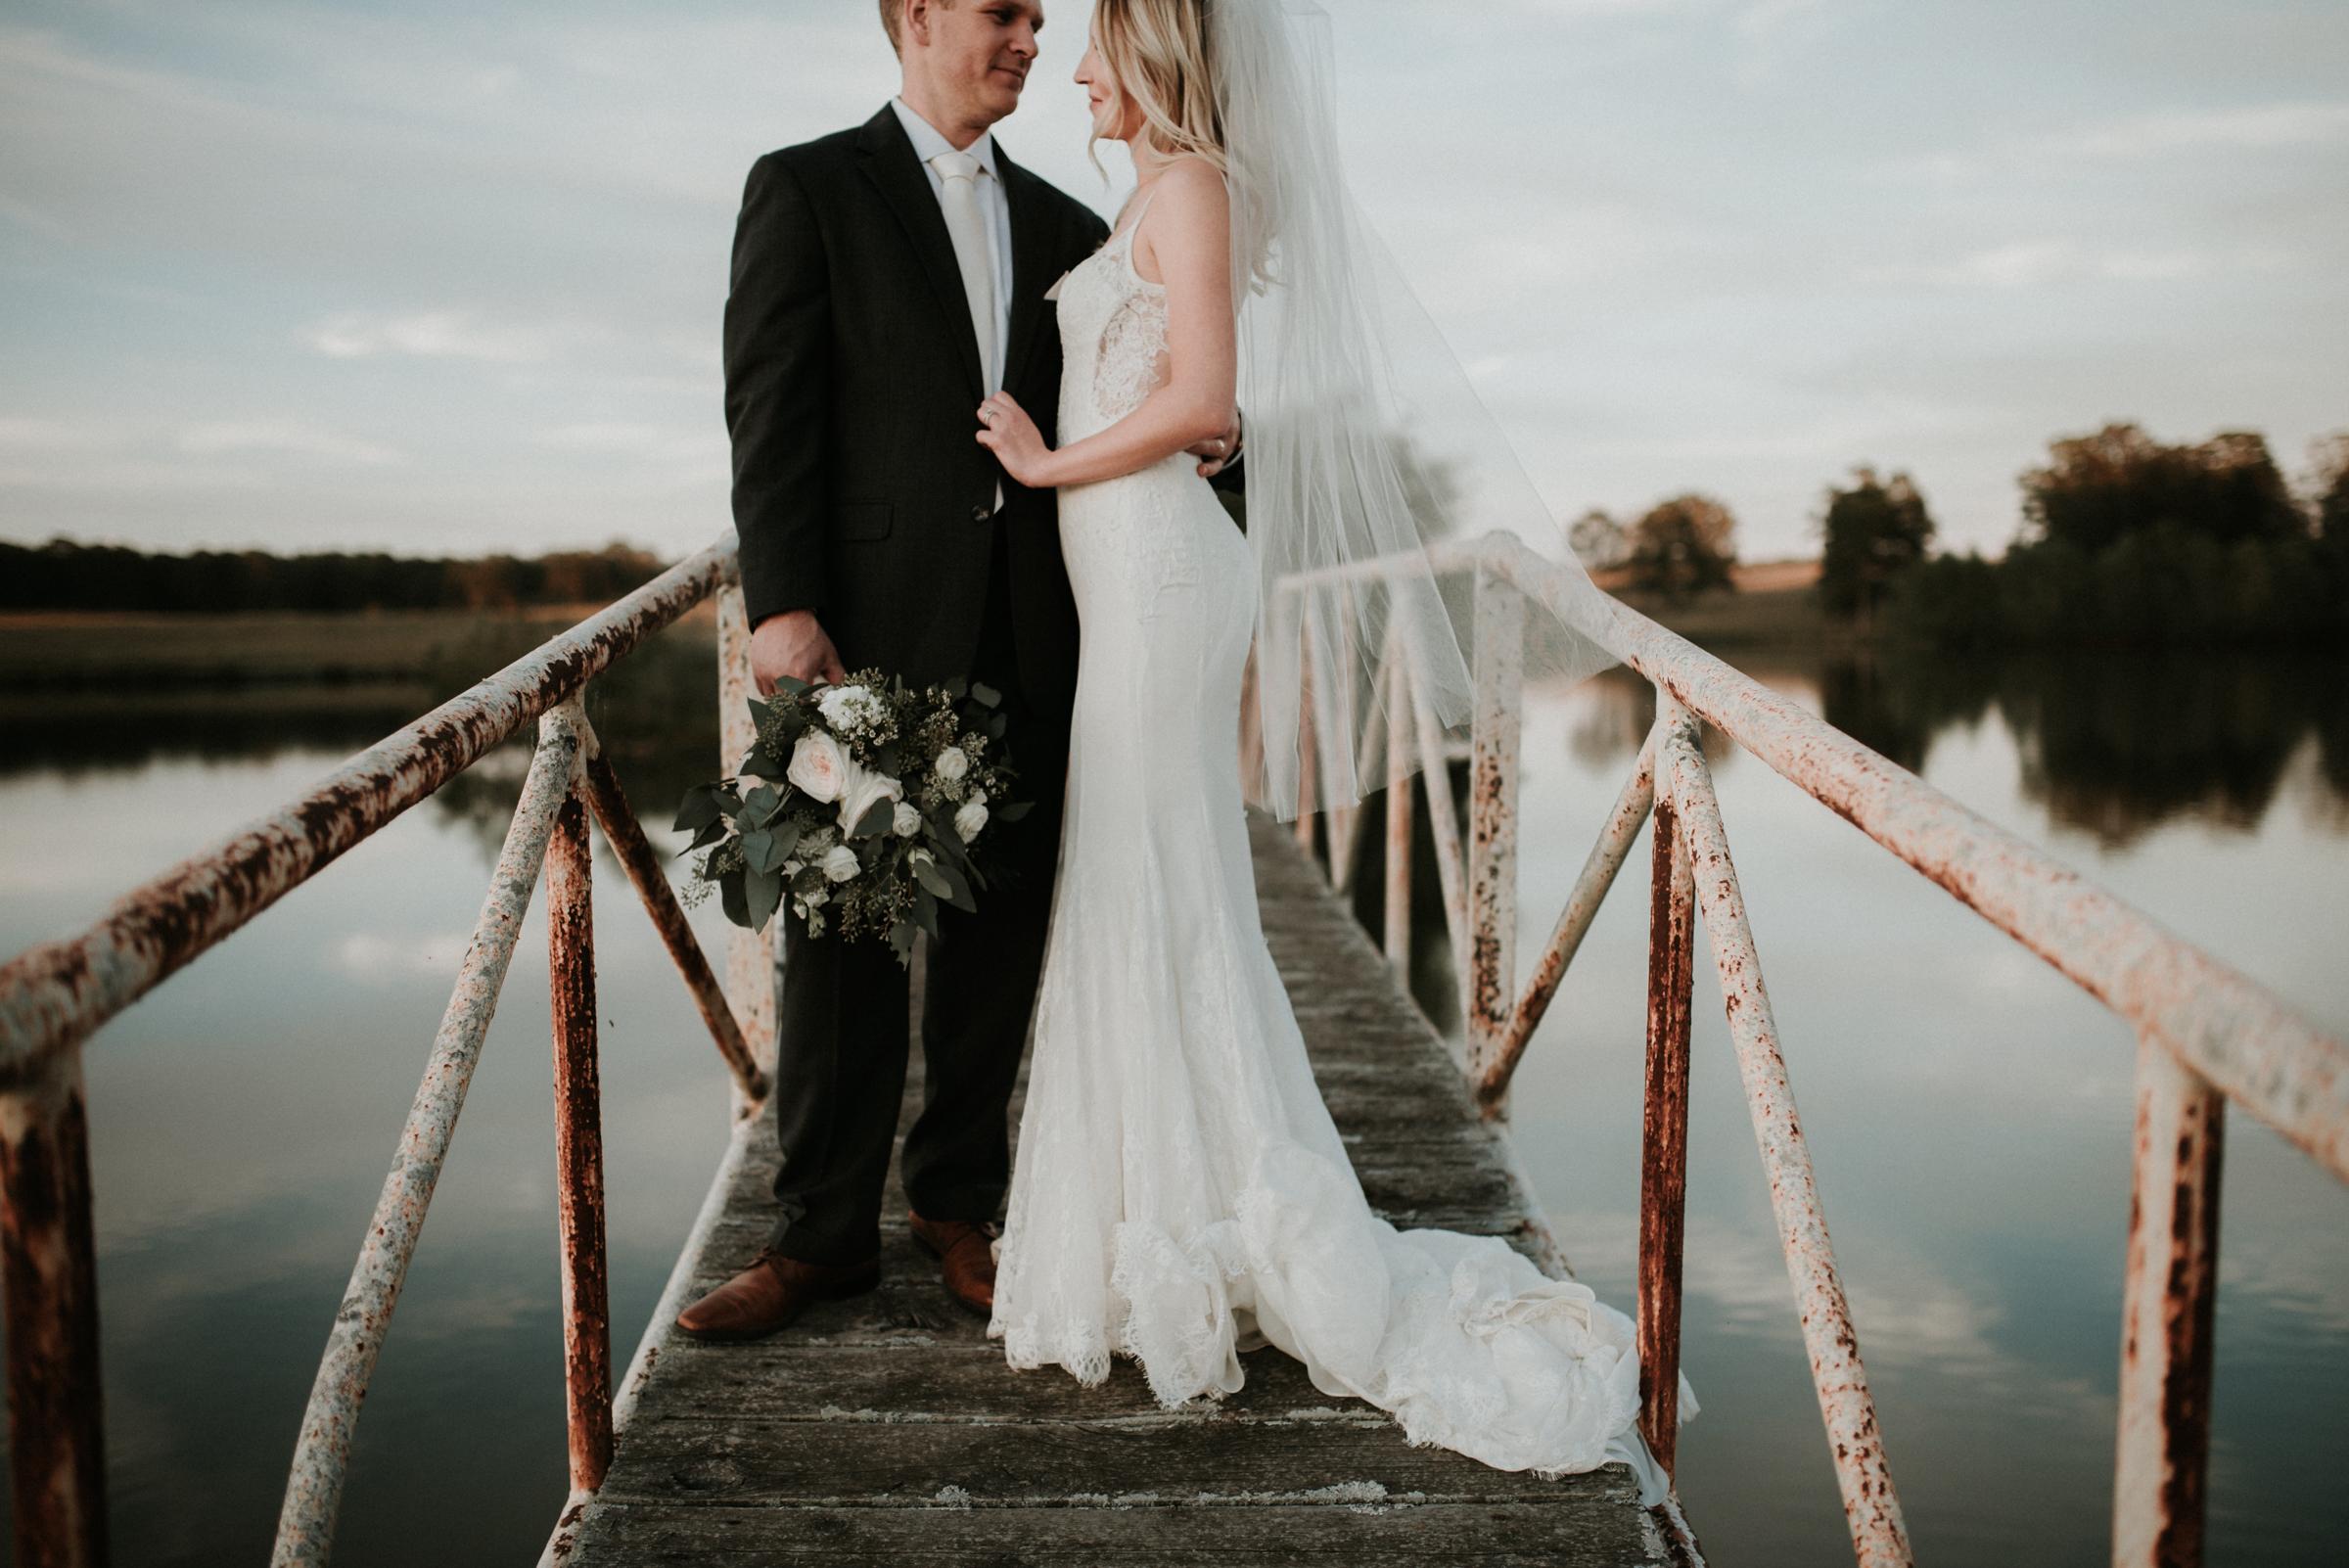 Zach&Rosalie Marion St. Louis Wedding Photographer-0800.jpg